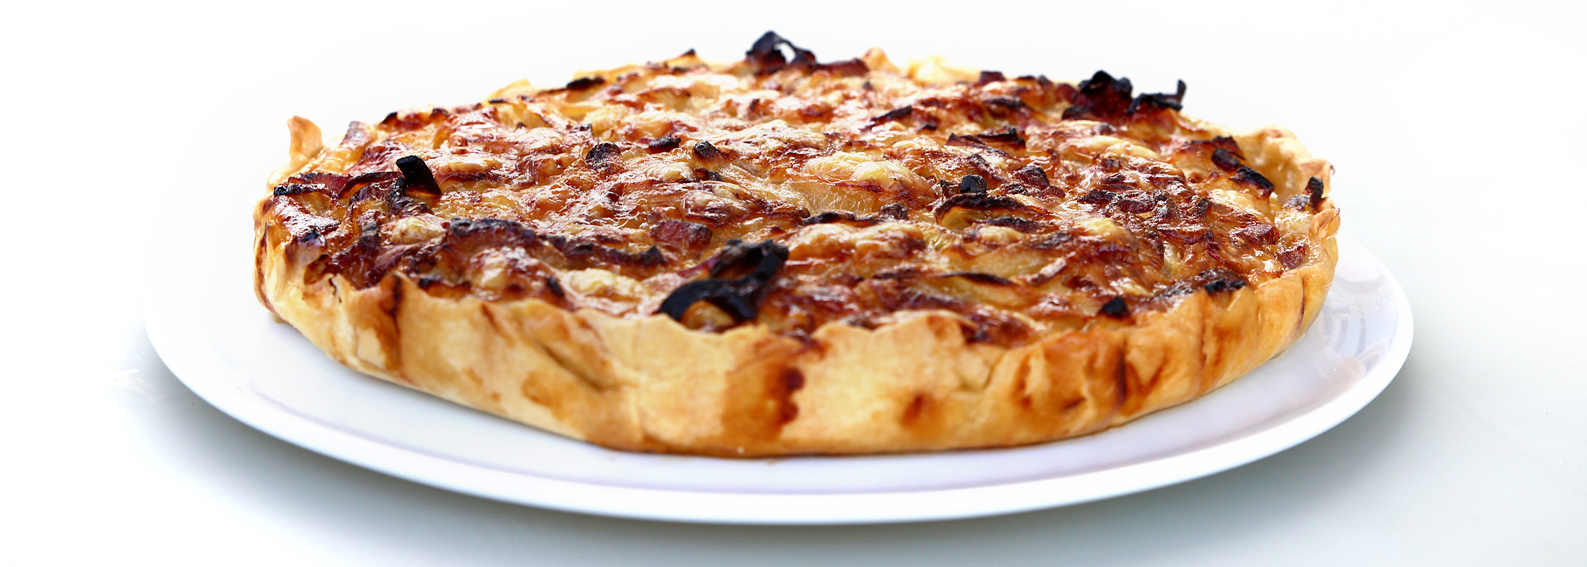 Le mercredi c 39 est p tisserie quiche normande - Recette tarte normande traditionnelle ...